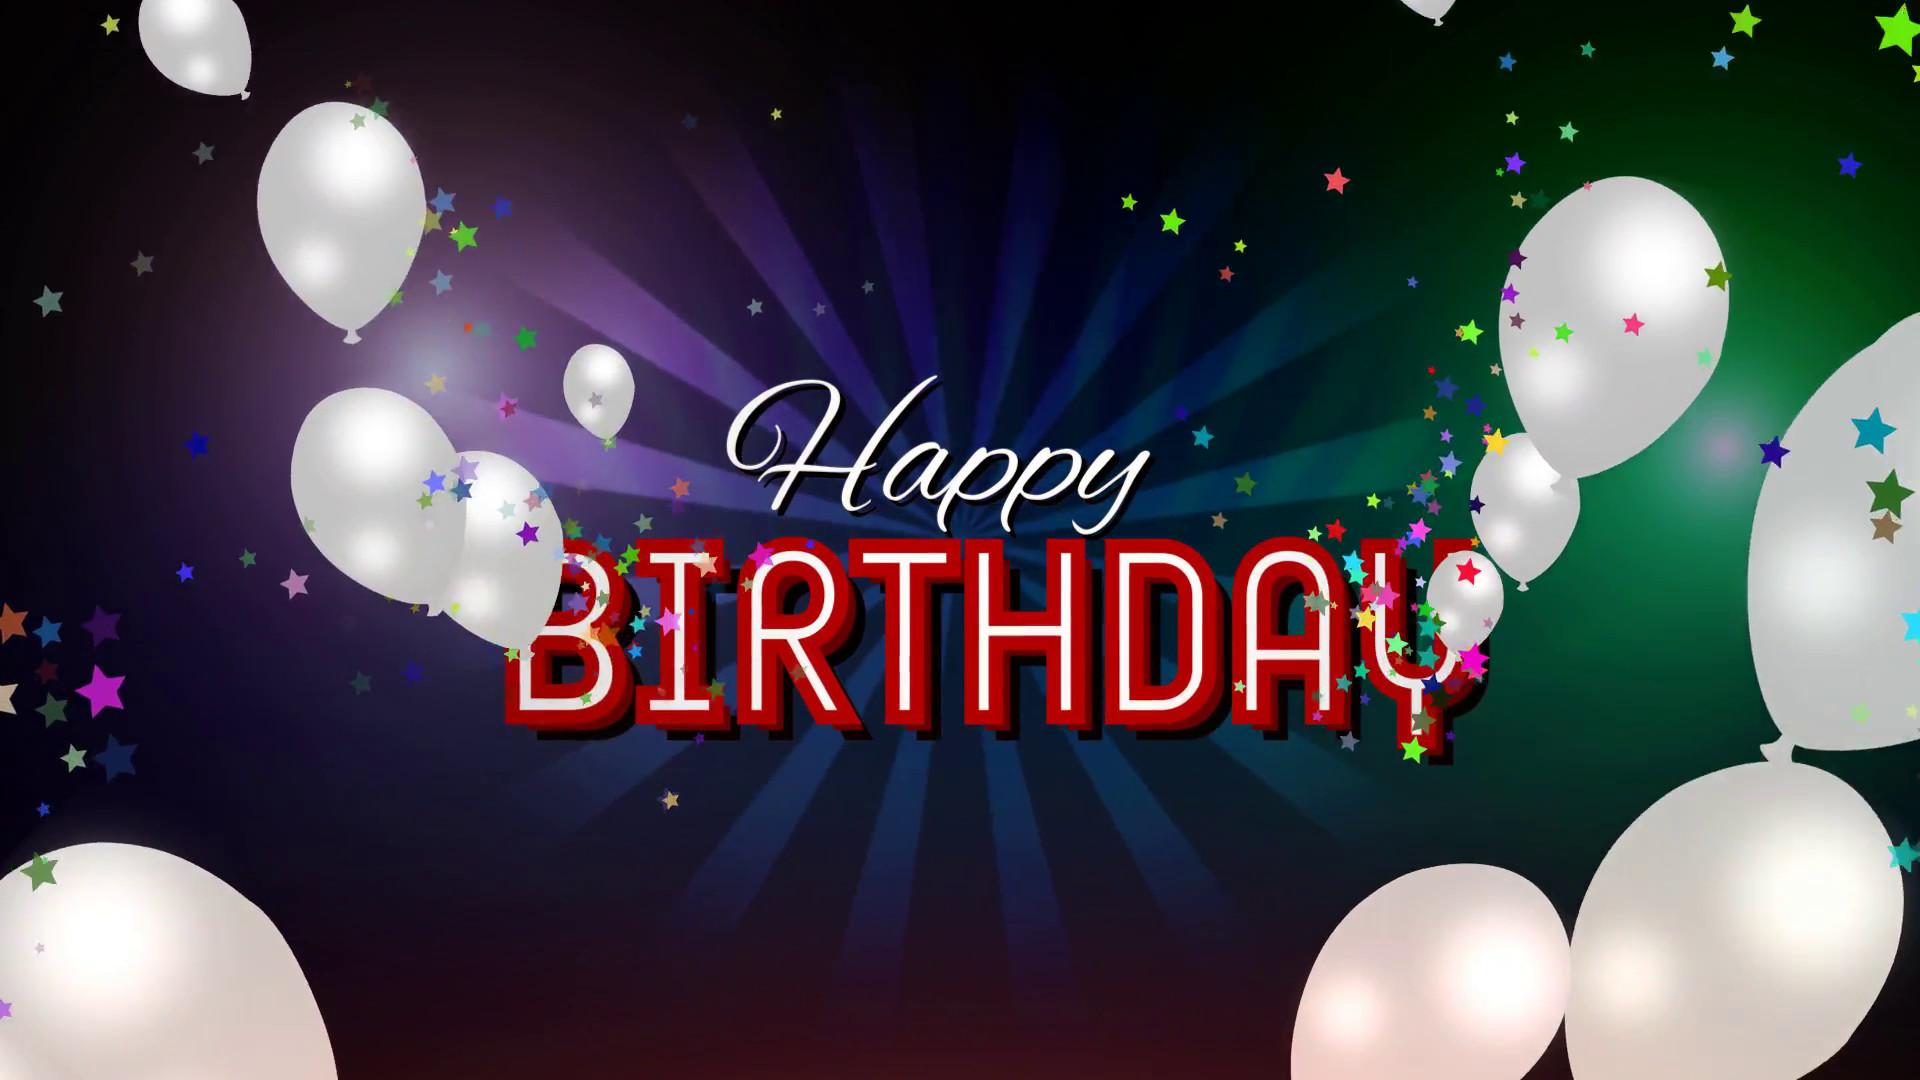 598932 free happy birthday background pictures